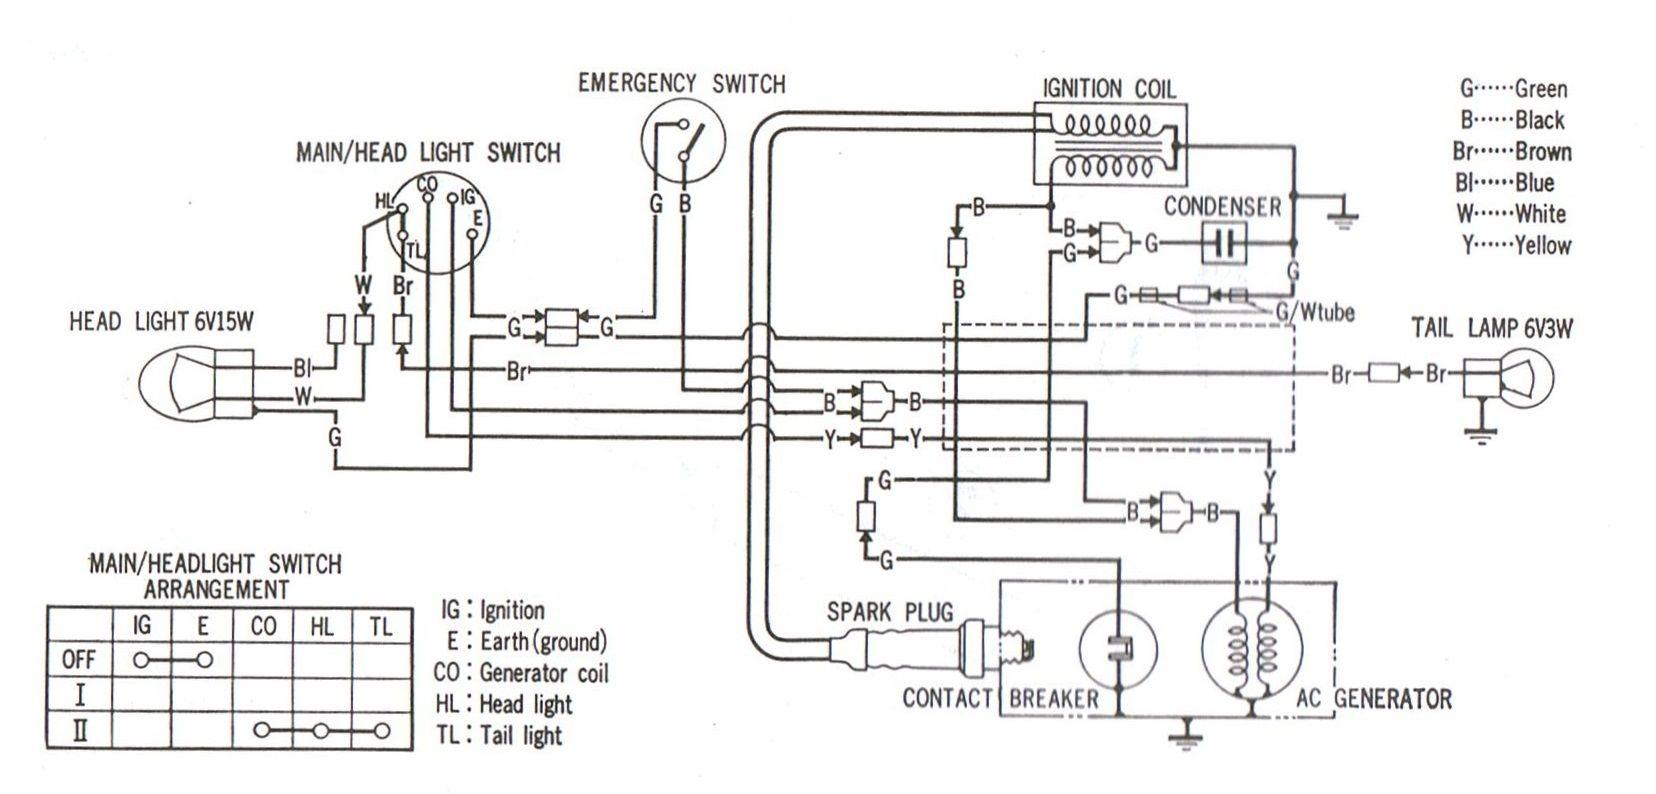 medium resolution of extraordinary 1982 honda c70 passport wiring diagram gallery best volvo c70 wiring diagram pdf c70 wiring diagram